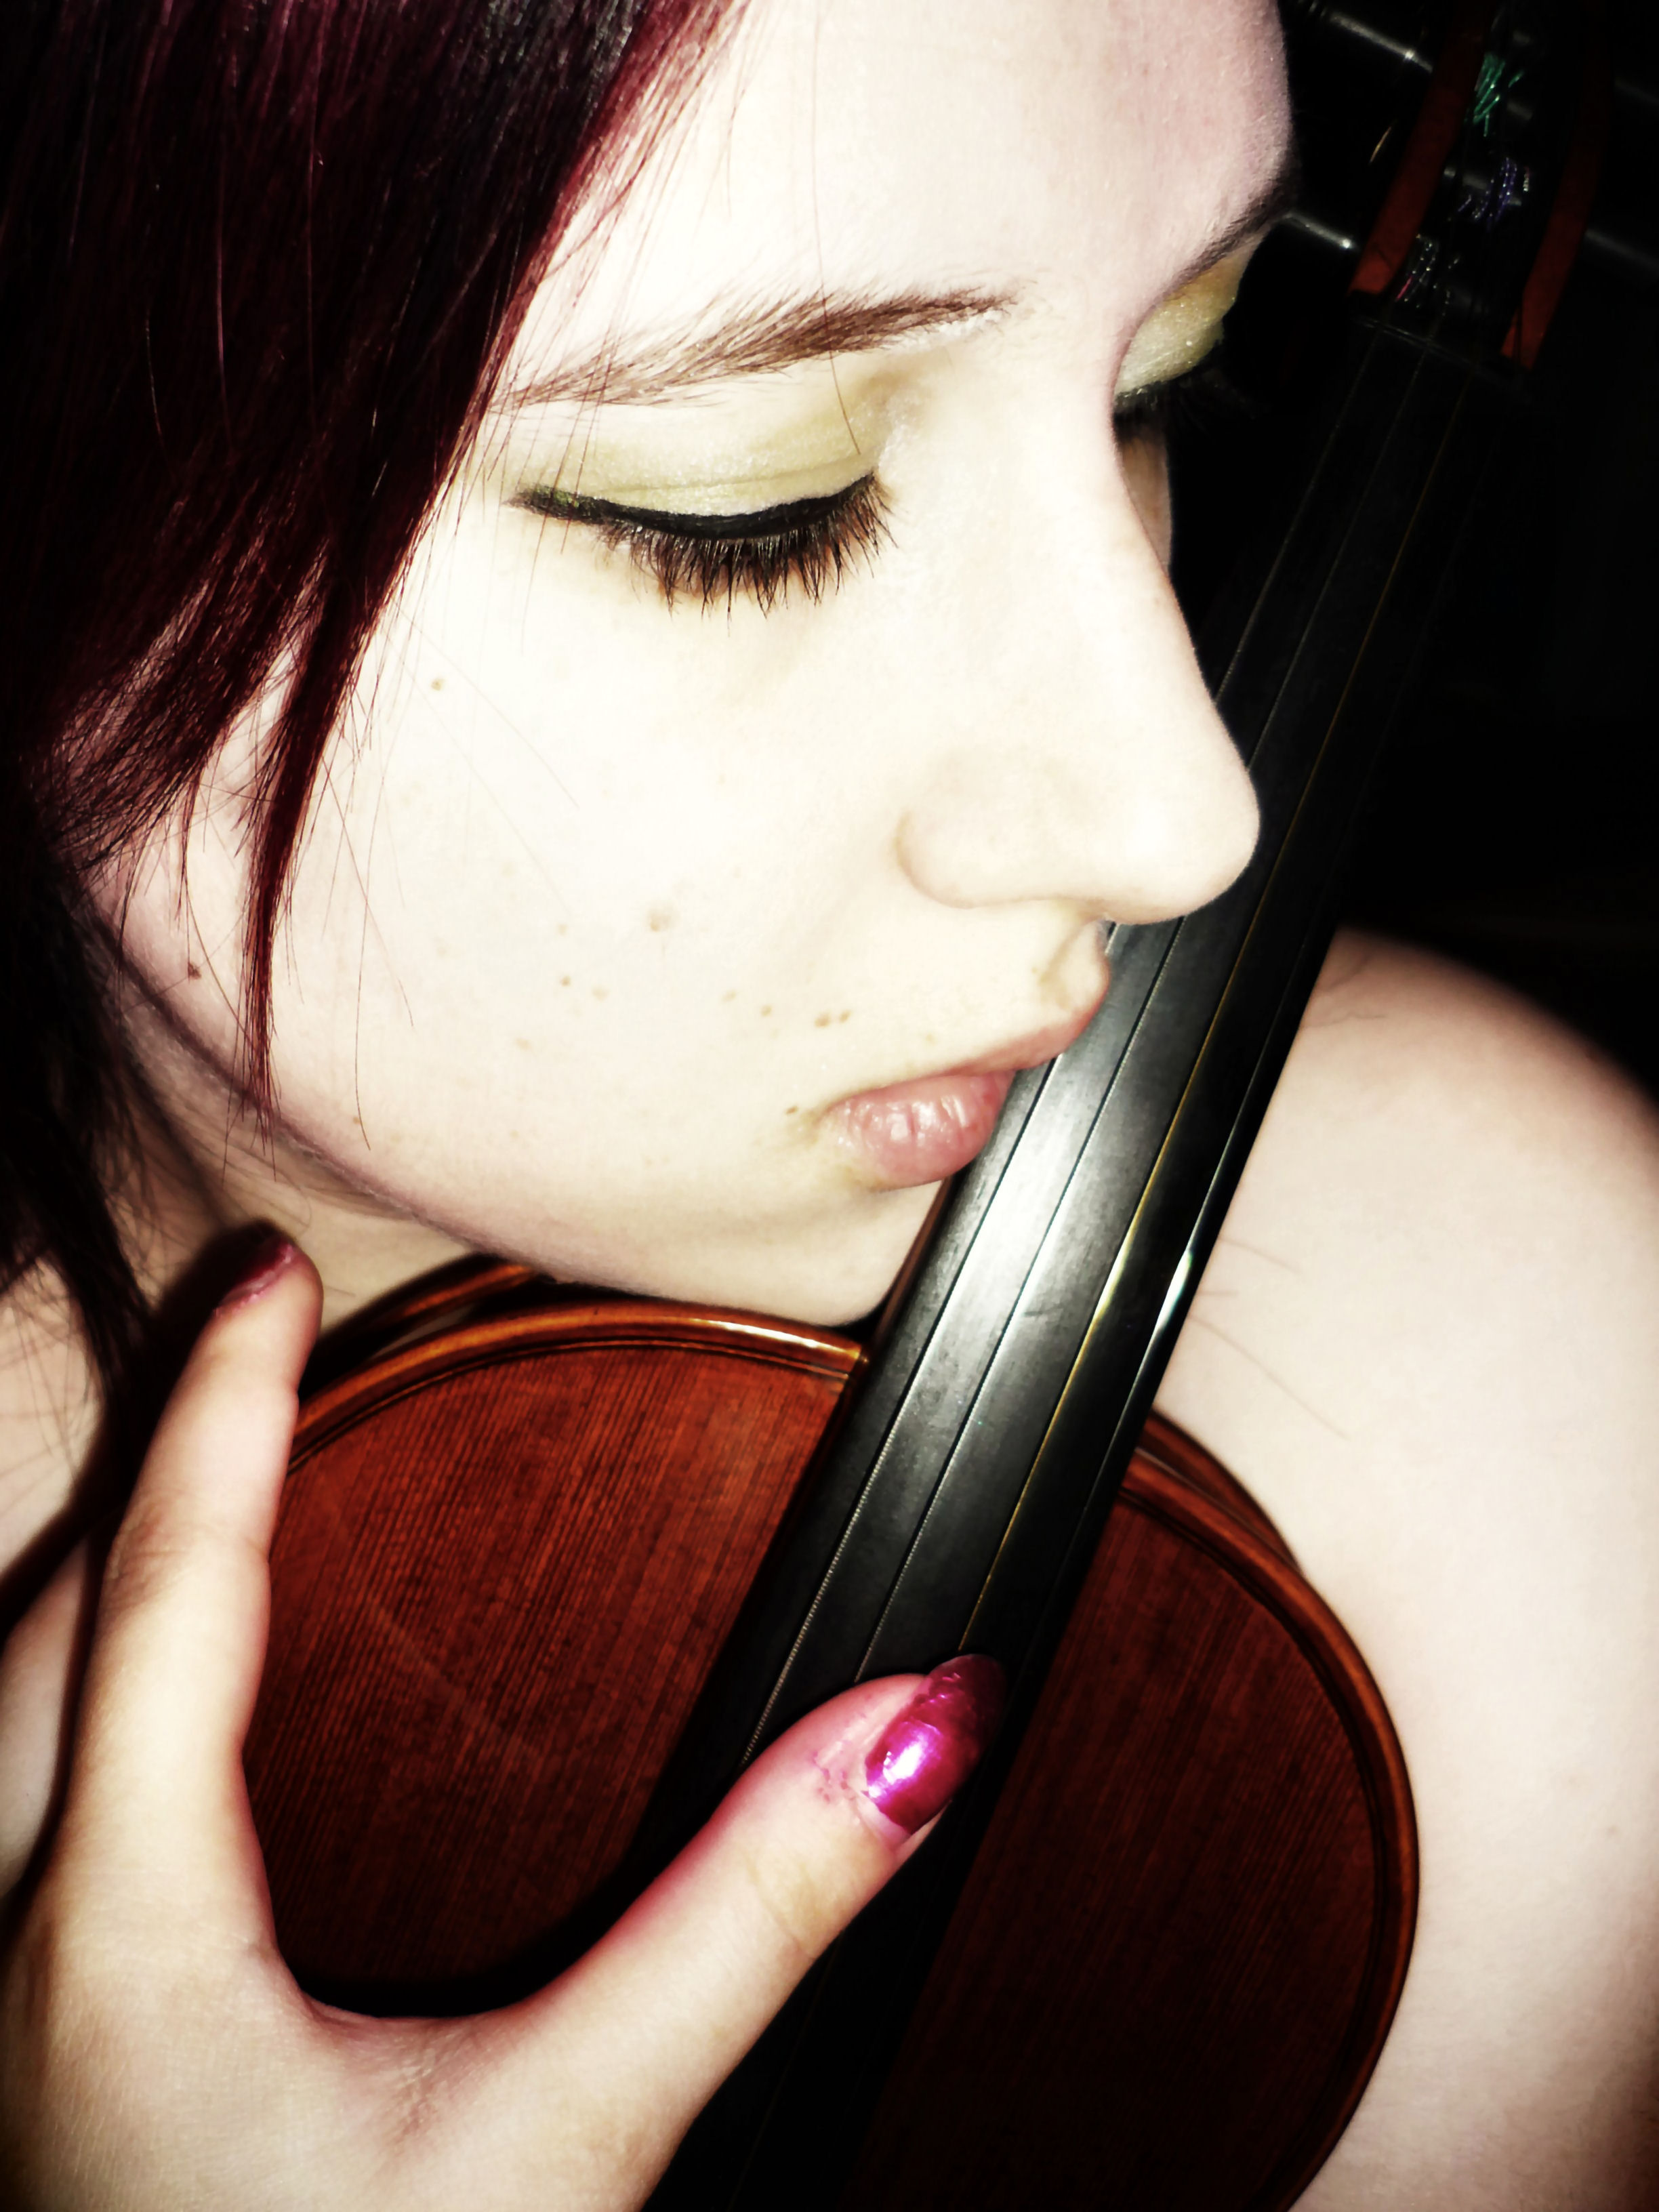 DarkenedAurora's Profile Picture